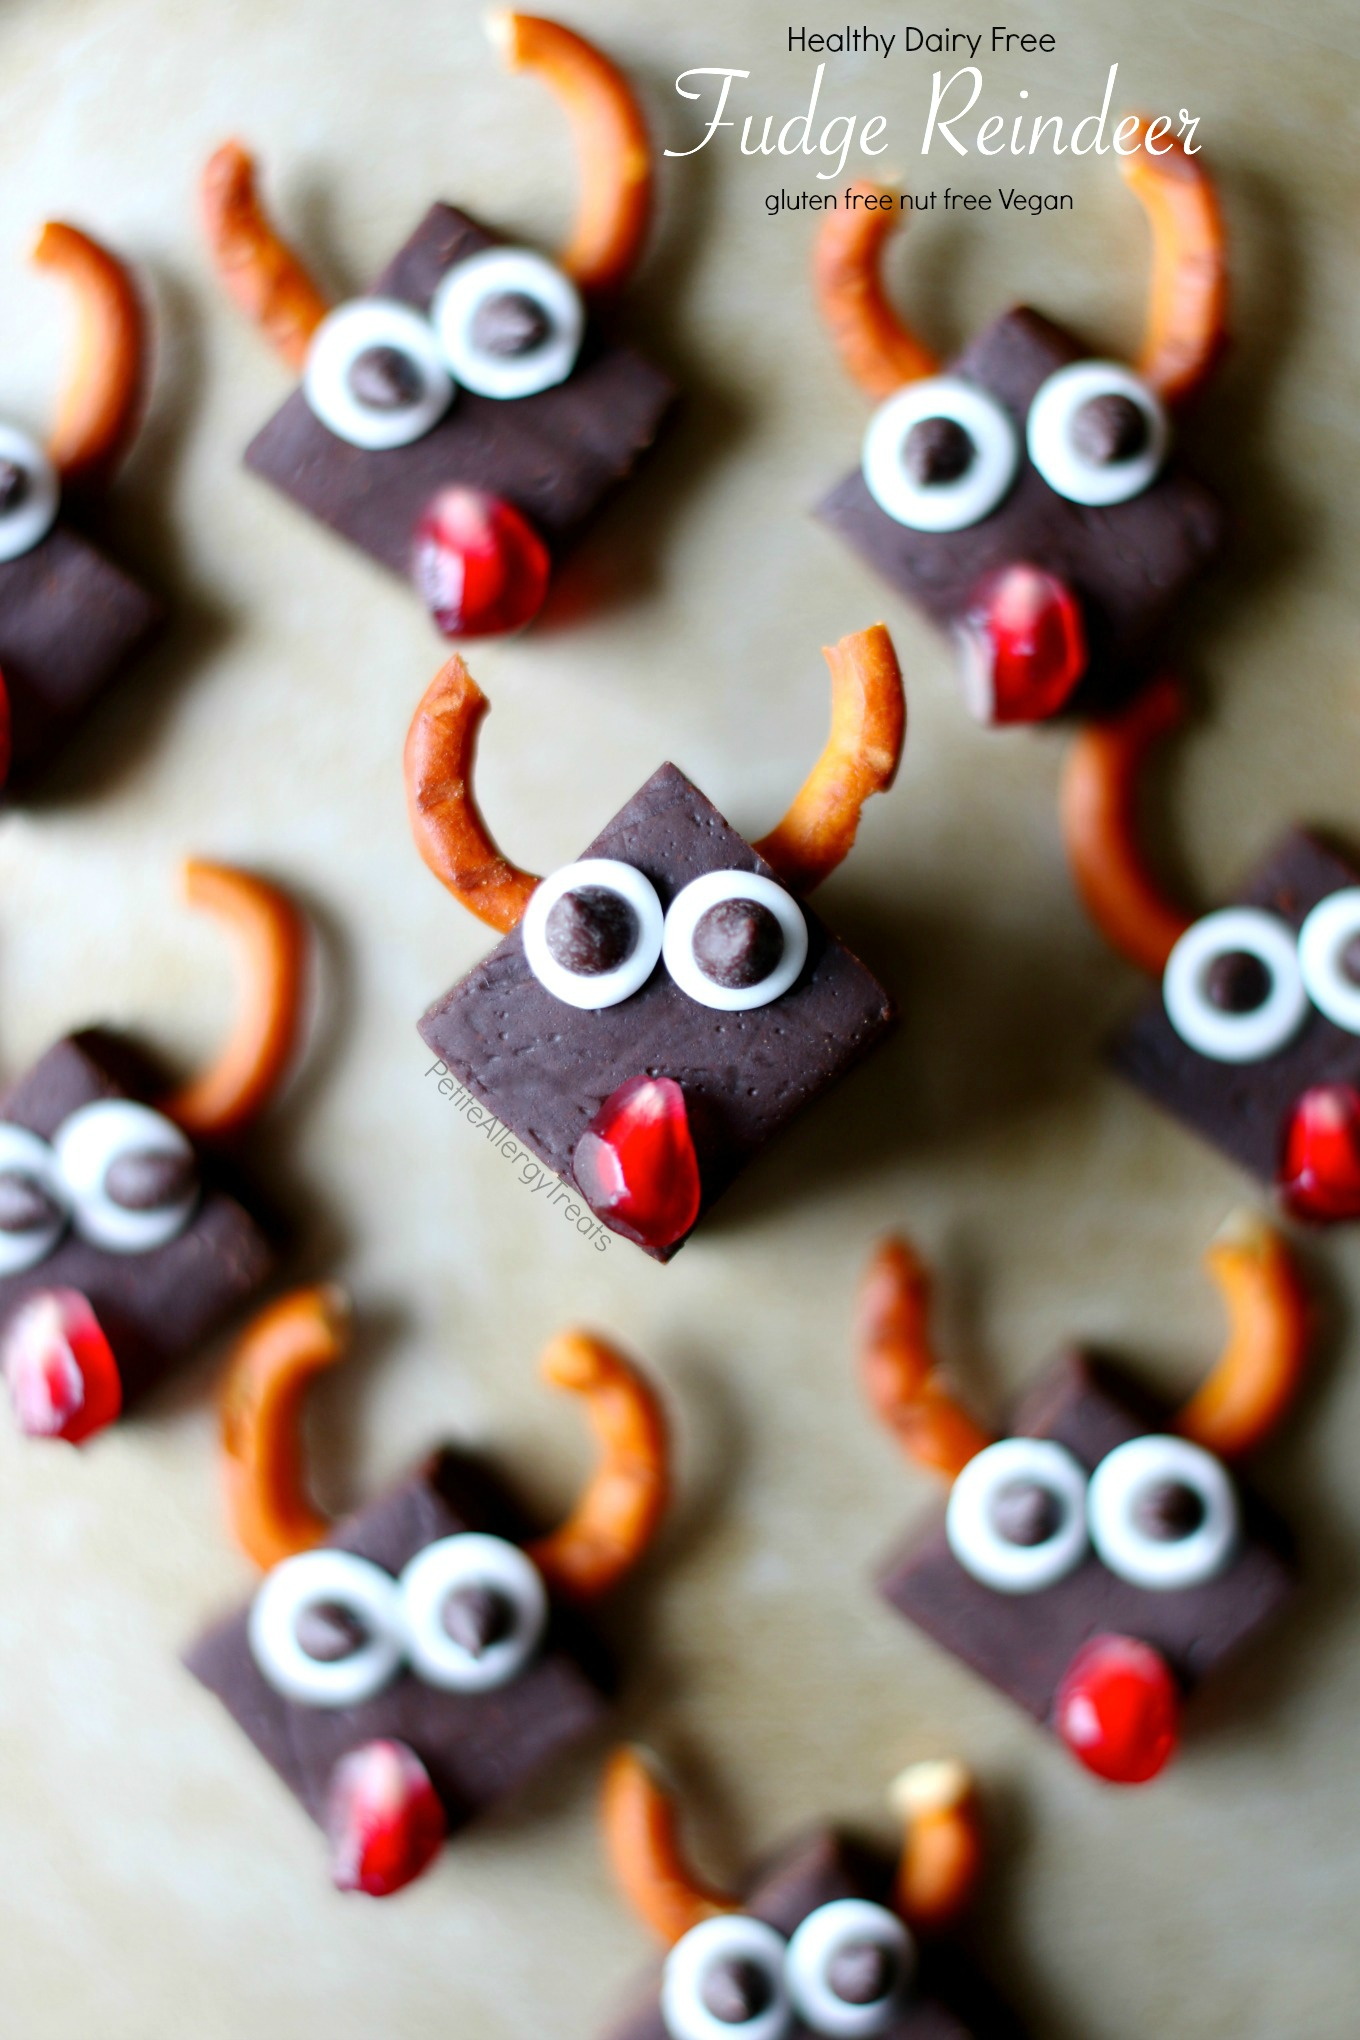 Healthy Dairy Free Fudge Reindeer Recipe (vegan gluten free)- Healthy chocolate fudge (with vegetables) for Christmas! Dye free gluten free and food allergy friendly